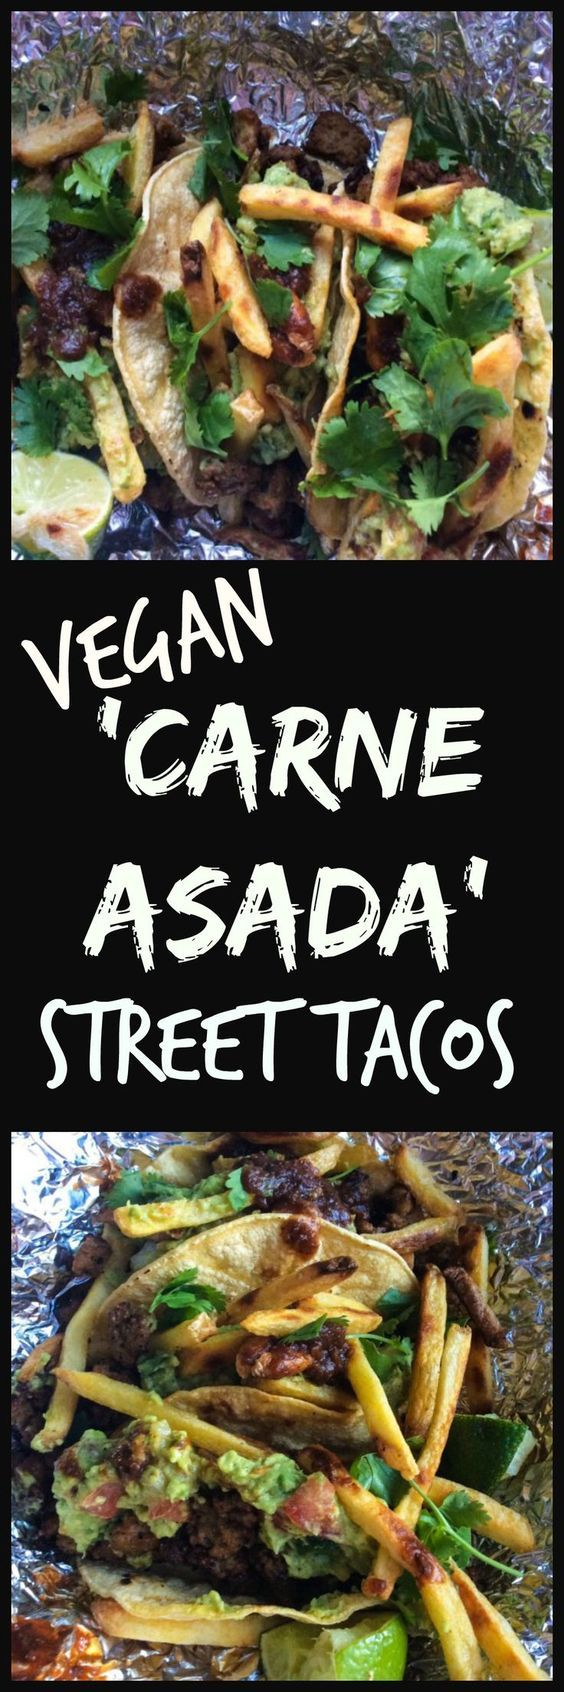 Mind blowing vegan carne asada tacos recipe from a food truck in Phoenix, AZ.